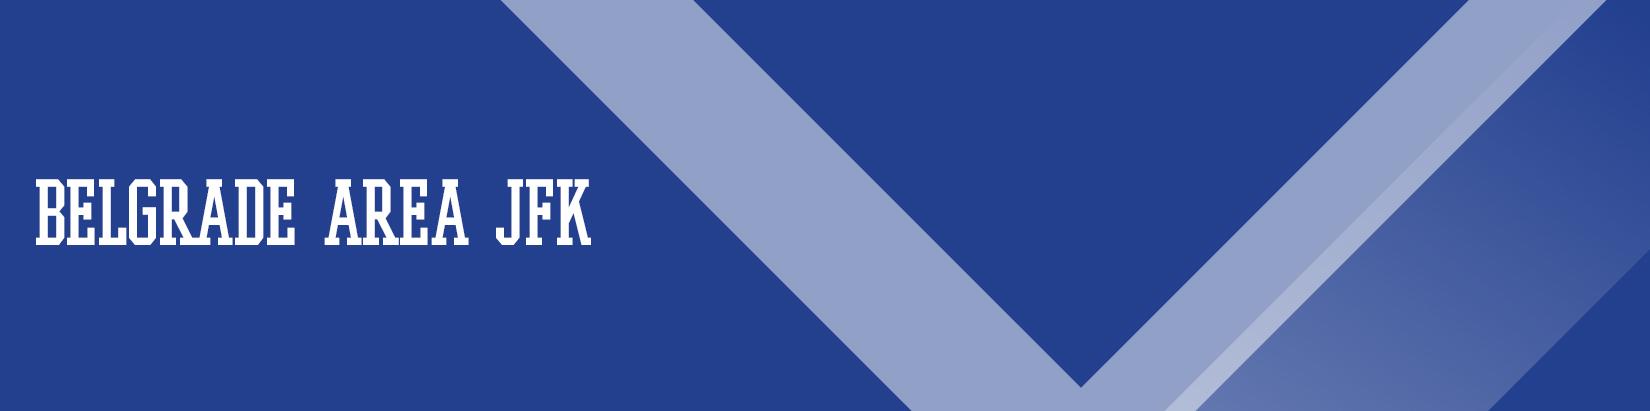 Belgrade JFK